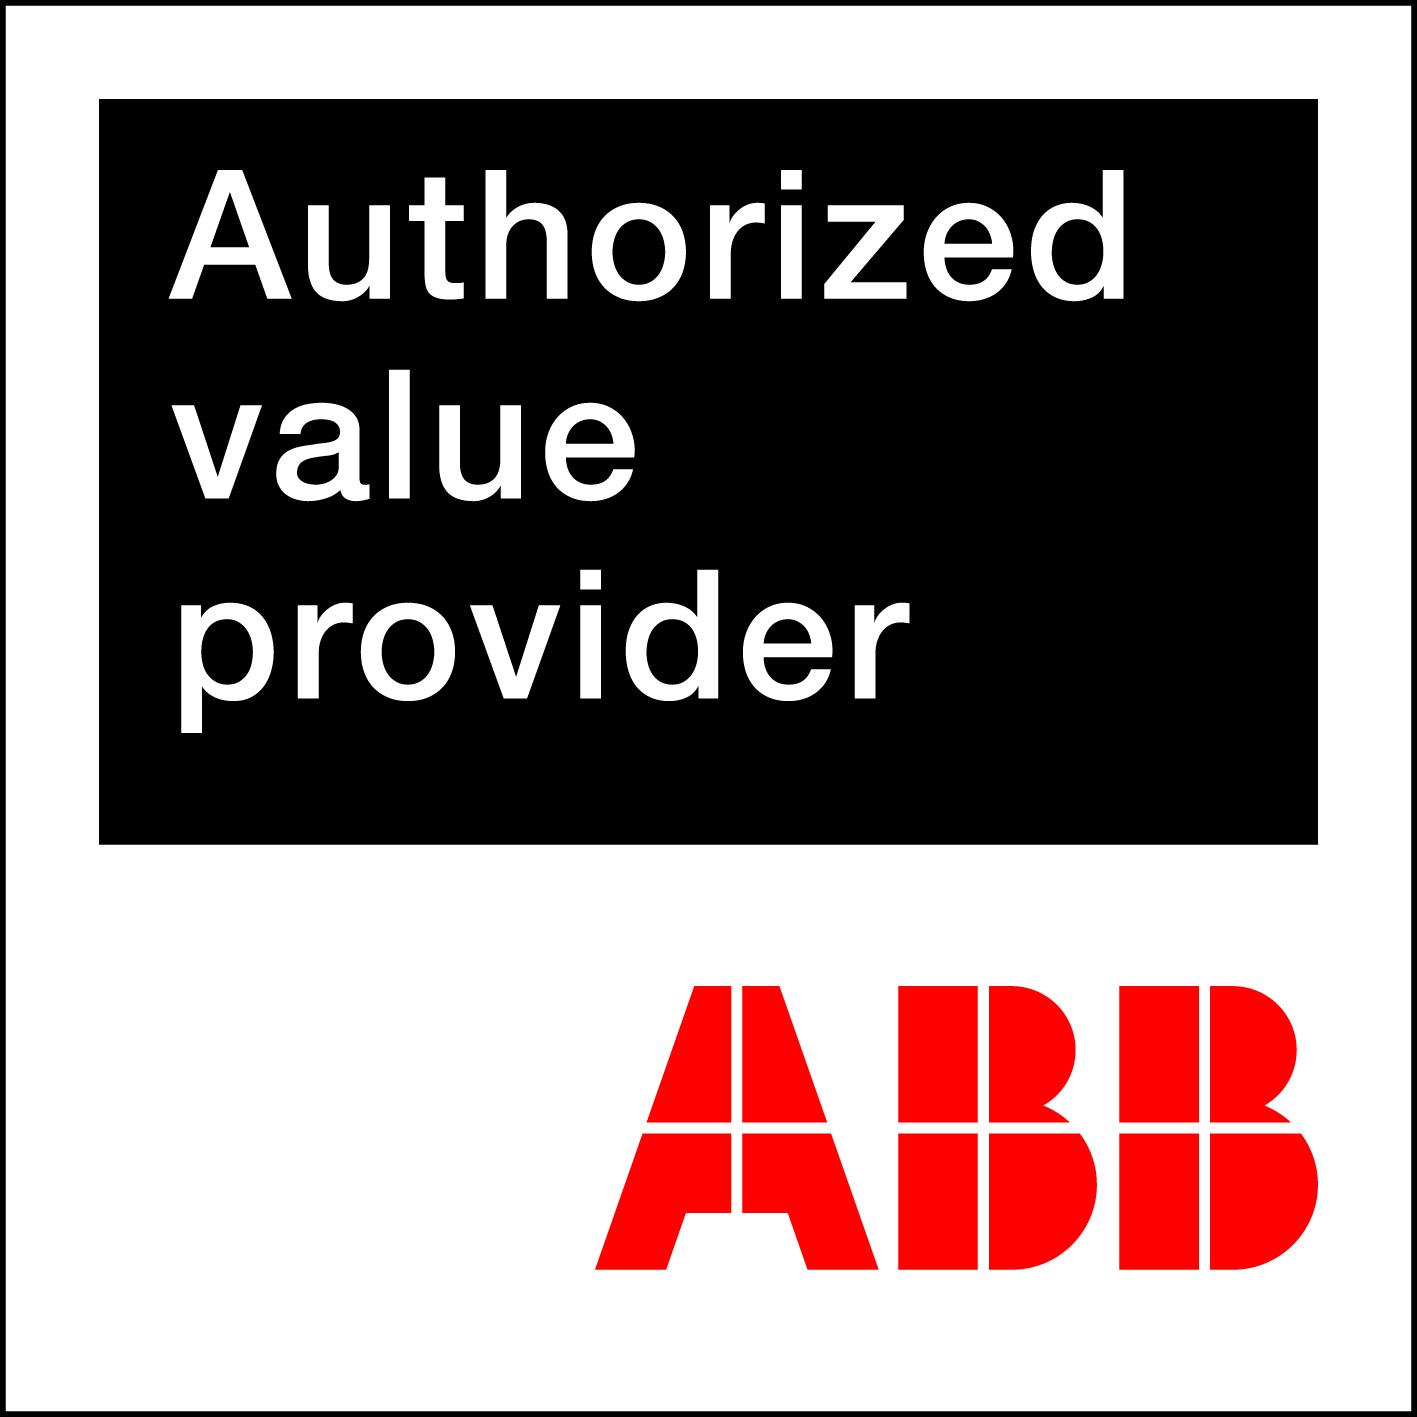 ABB_AVP_cmyk_10mm.jpg